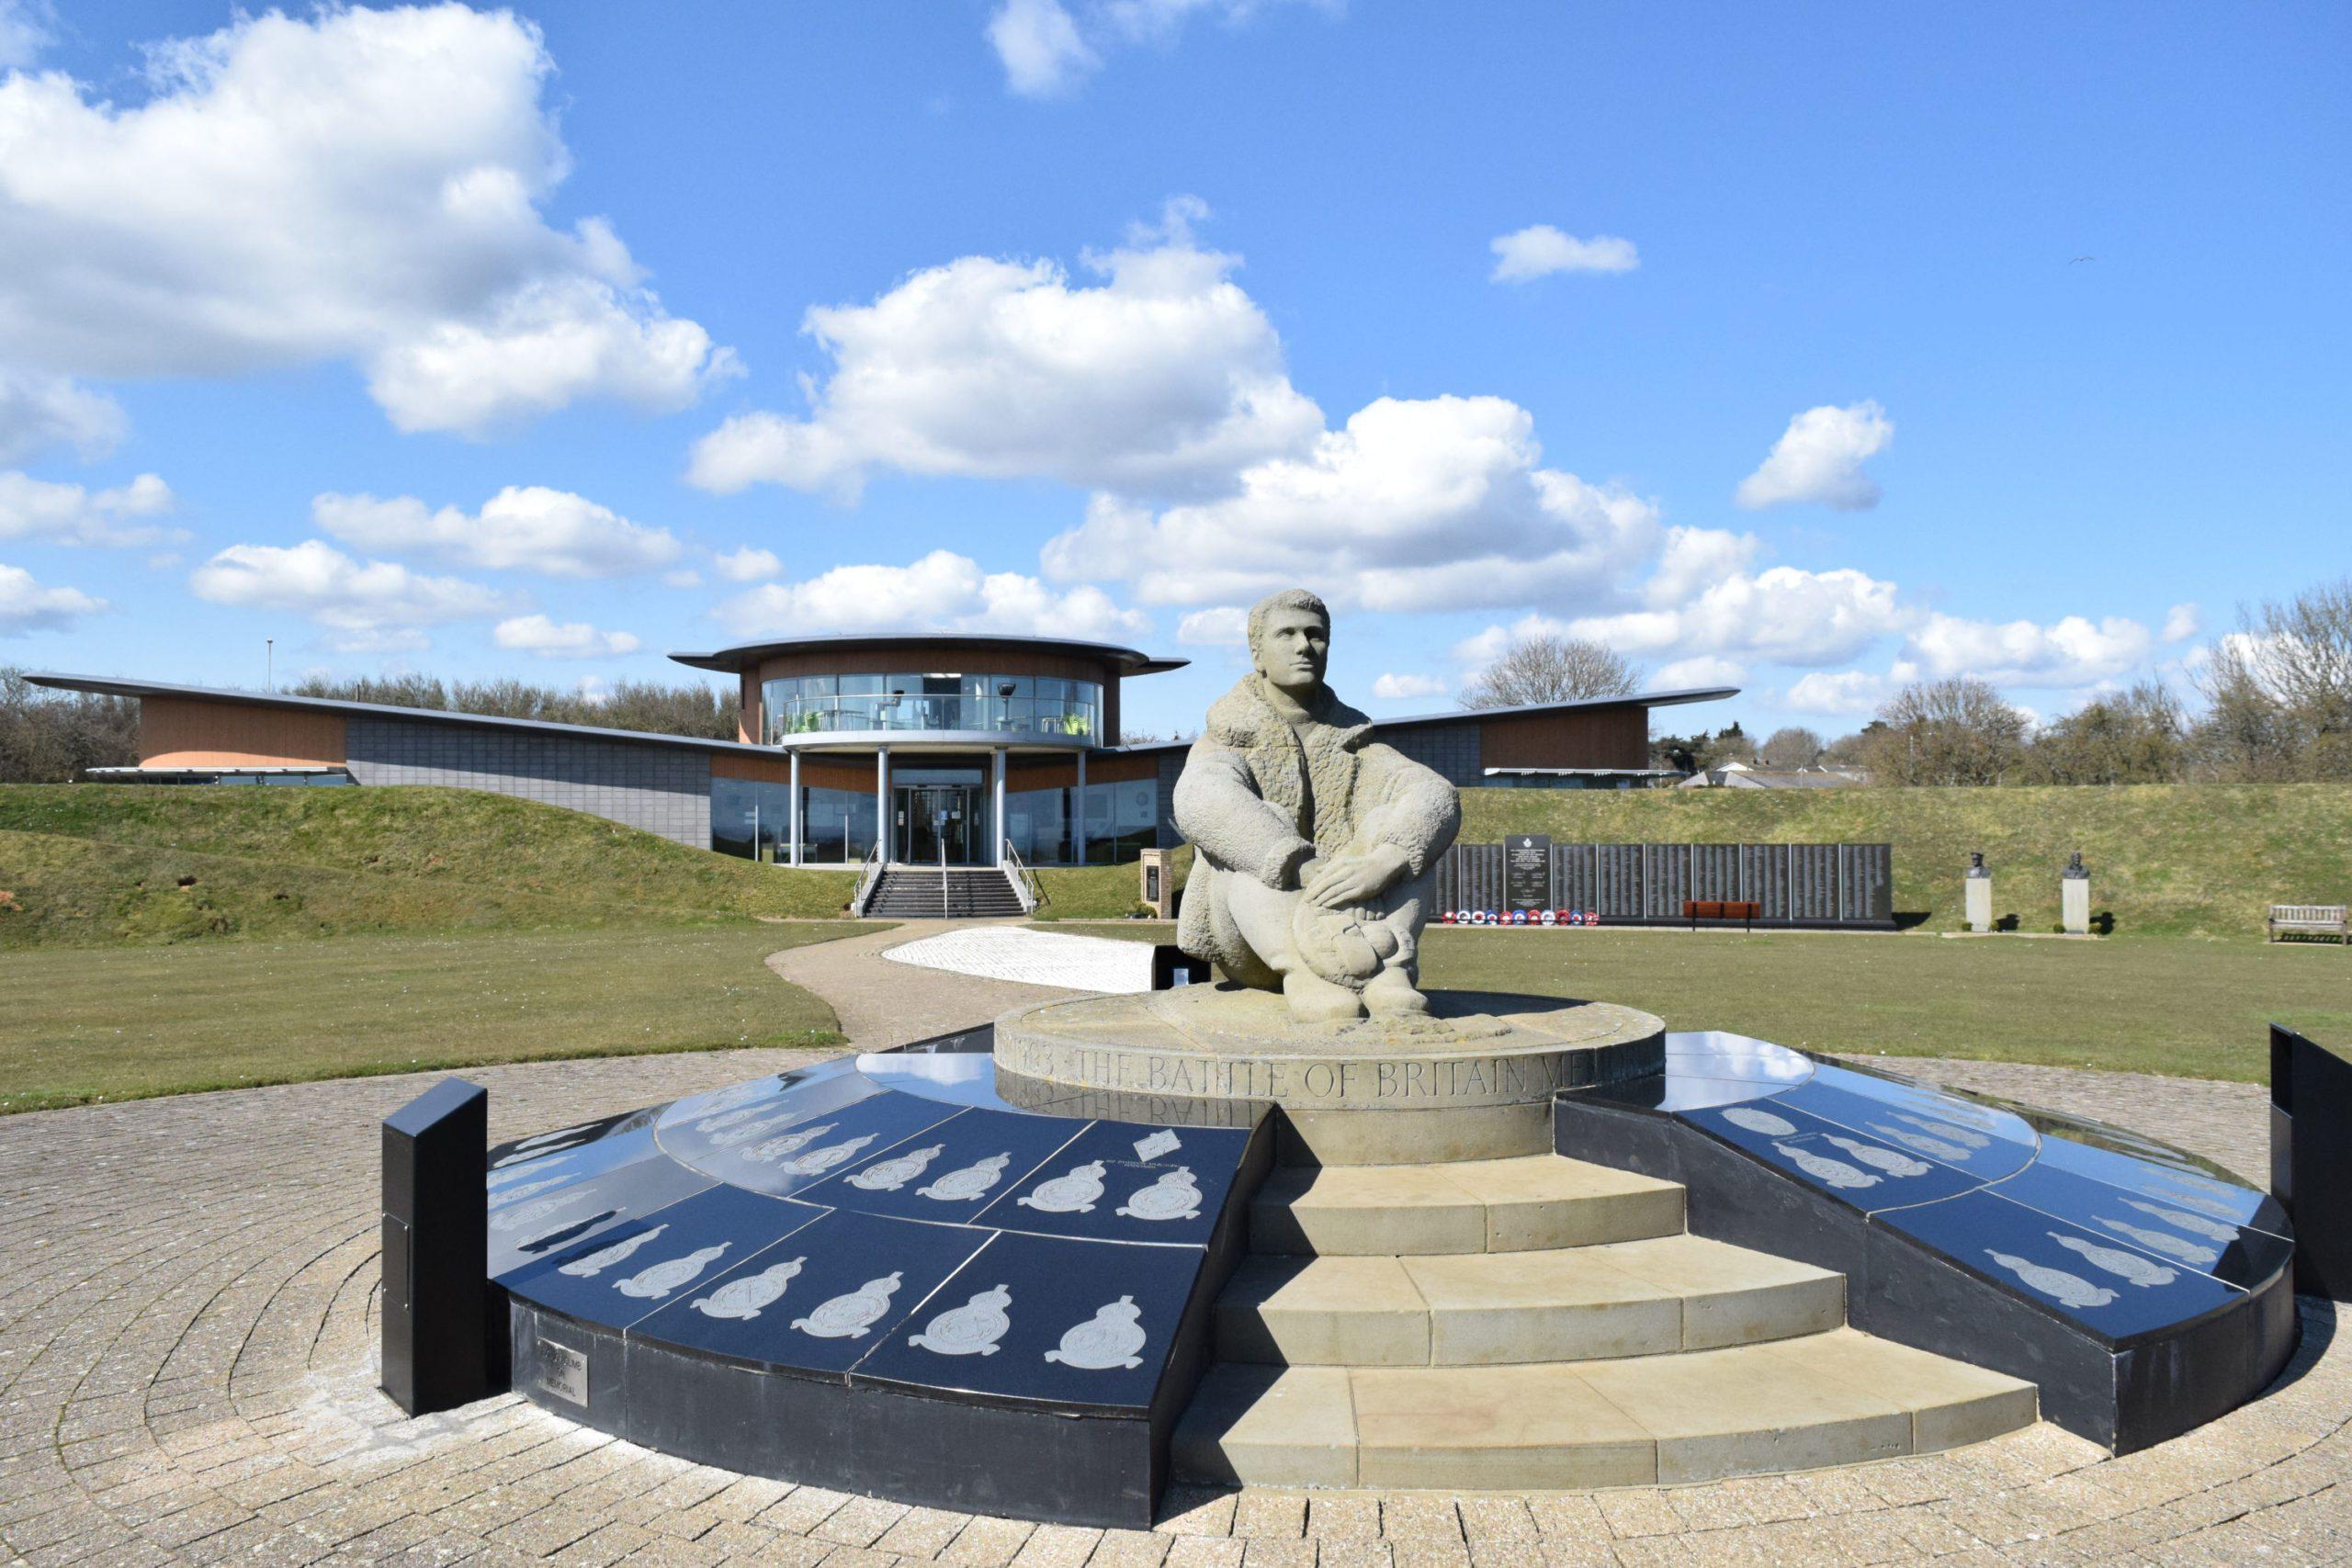 Battle of Britain Memorial and Wing Museum